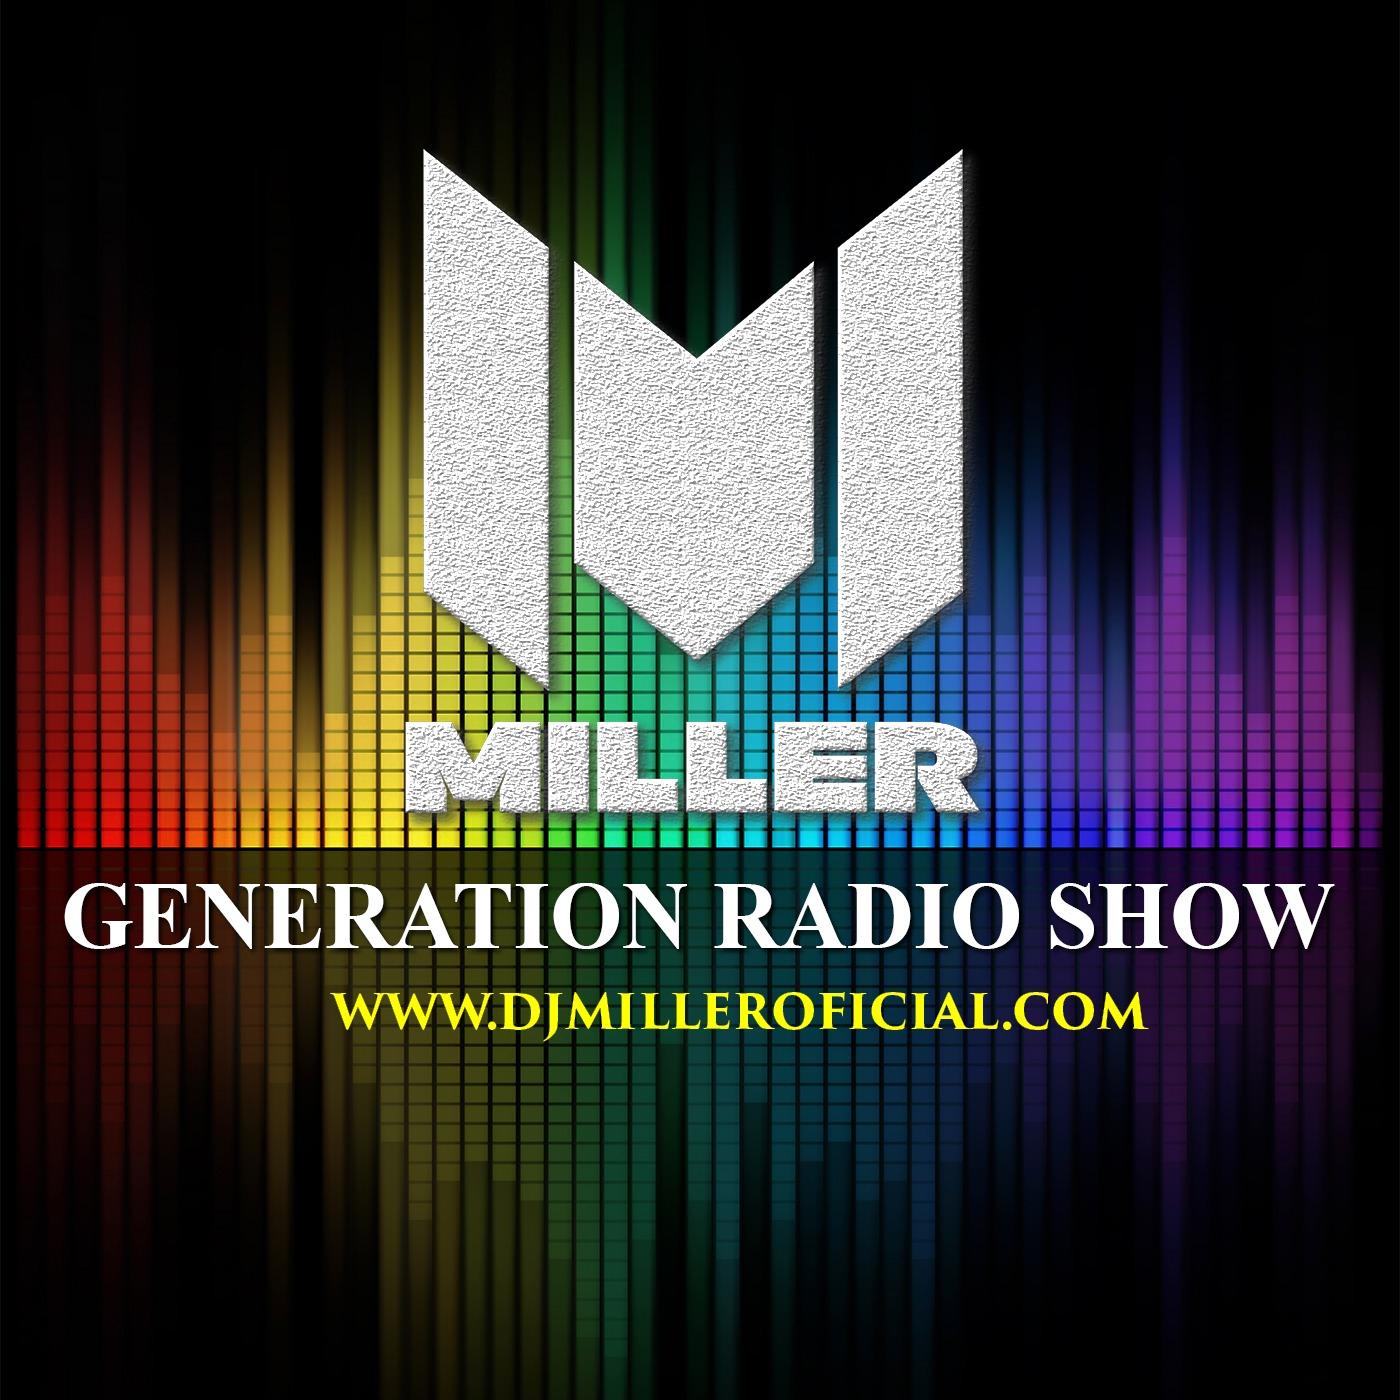 Generation Radio Show